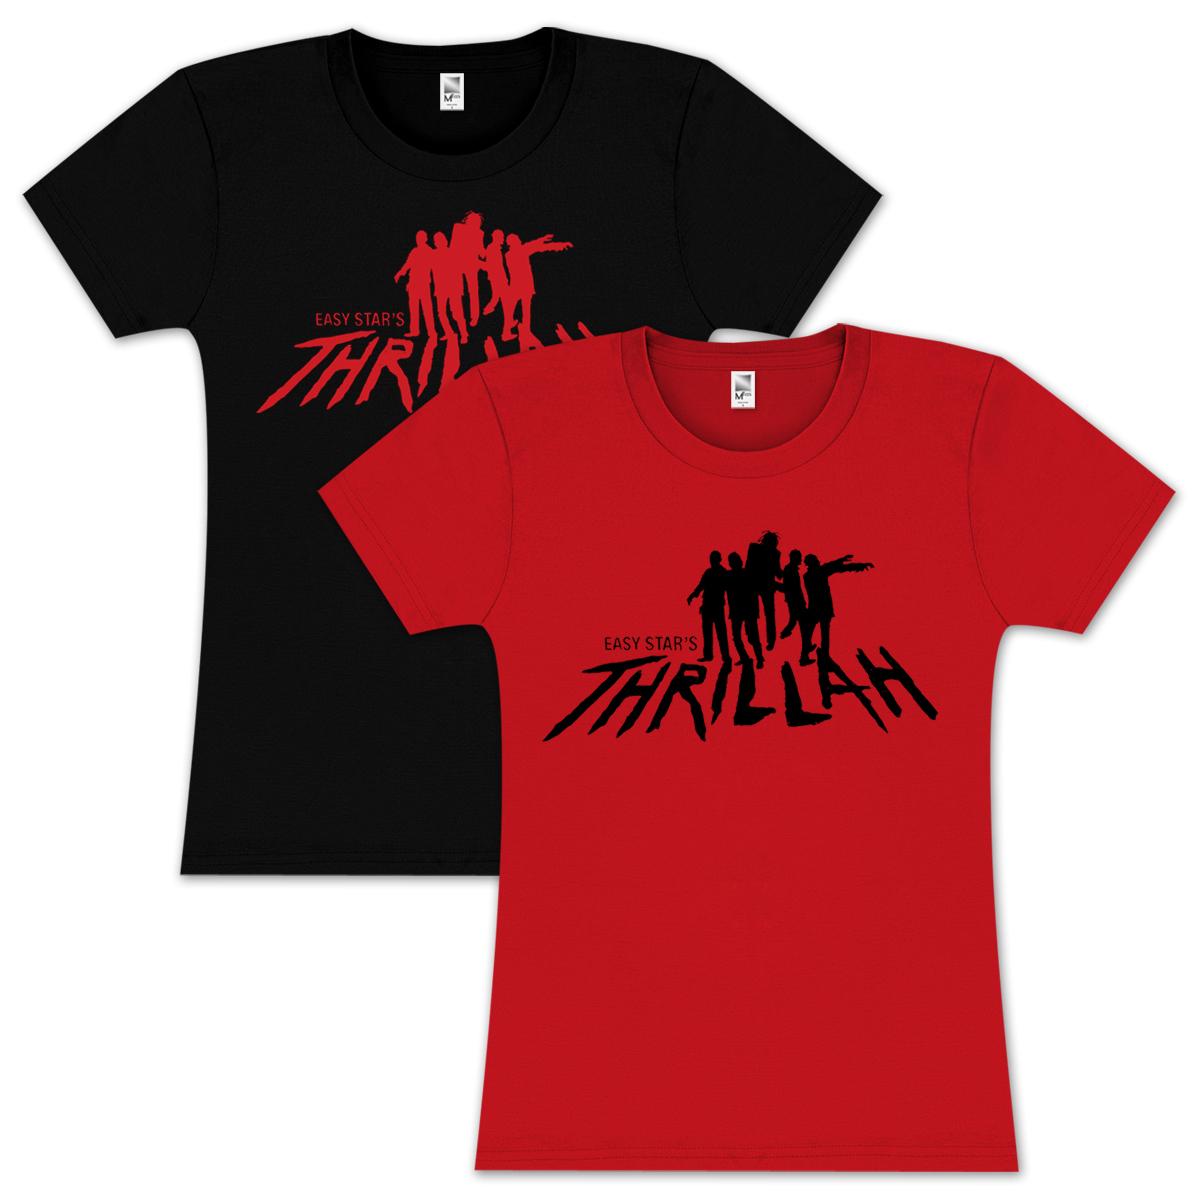 Easy Star Thrillah T-Shirt Women's